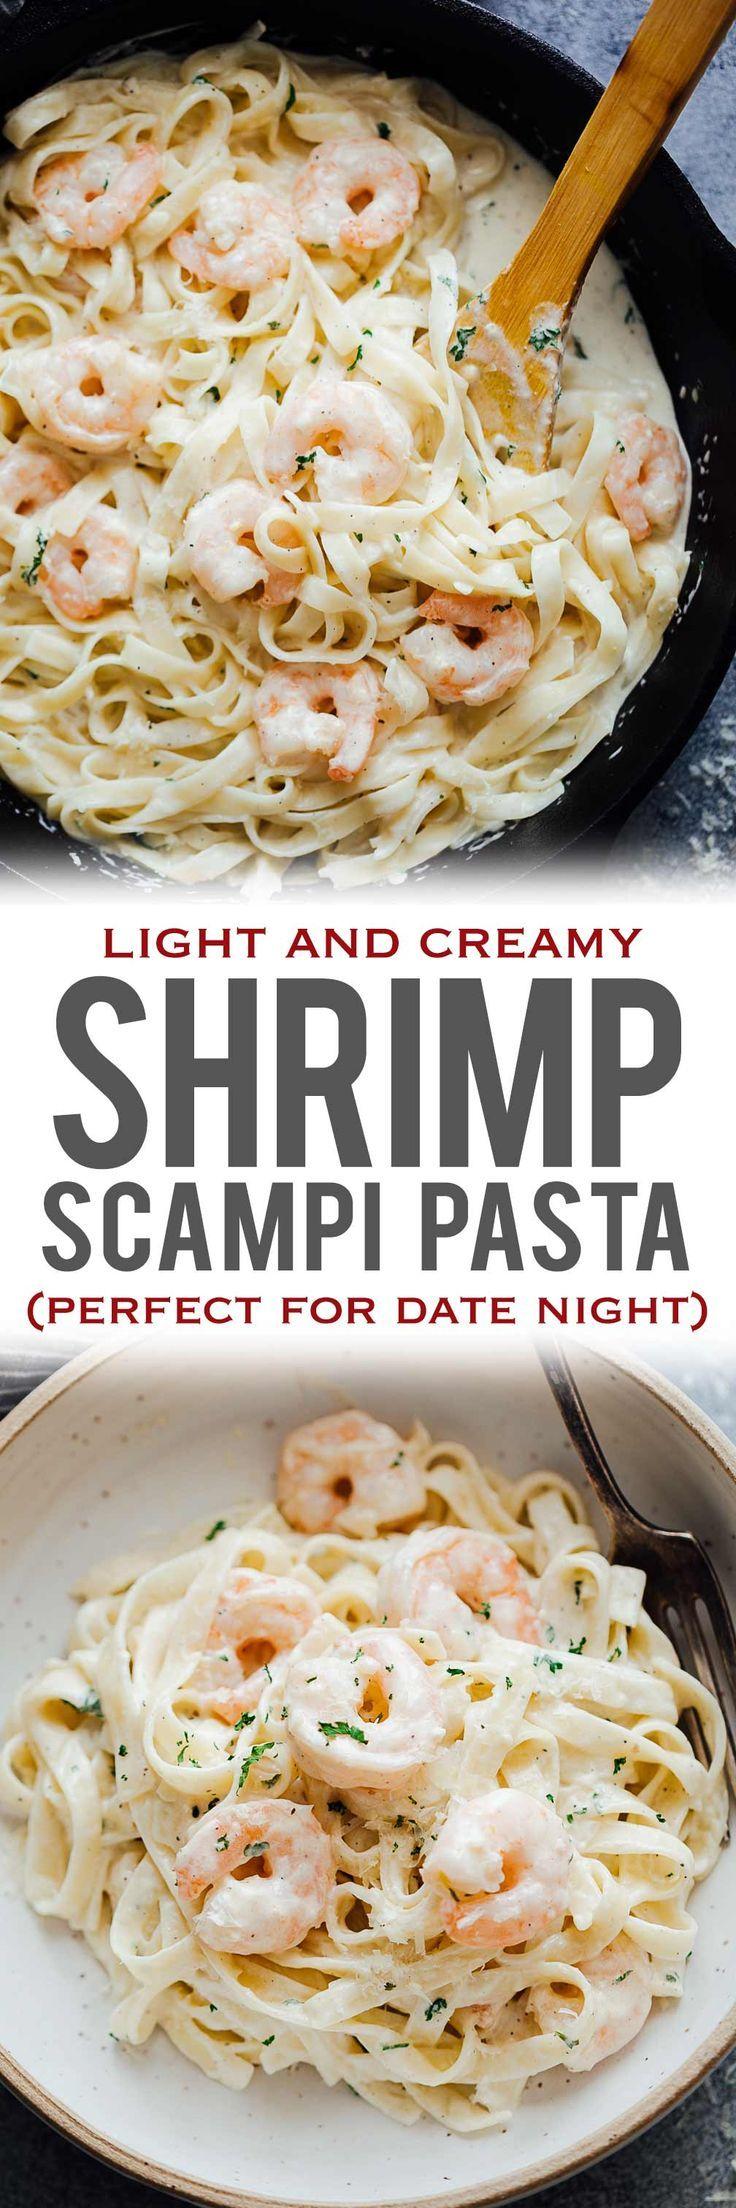 Creamy Shrimp Scampi Pasta Is A Quick Pasta Recipe Where Prawn Or Shrimp Is Tossed In A Garlic Butter Quick Pasta Recipes Pasta Recipes Easy Fast Scampi Pasta